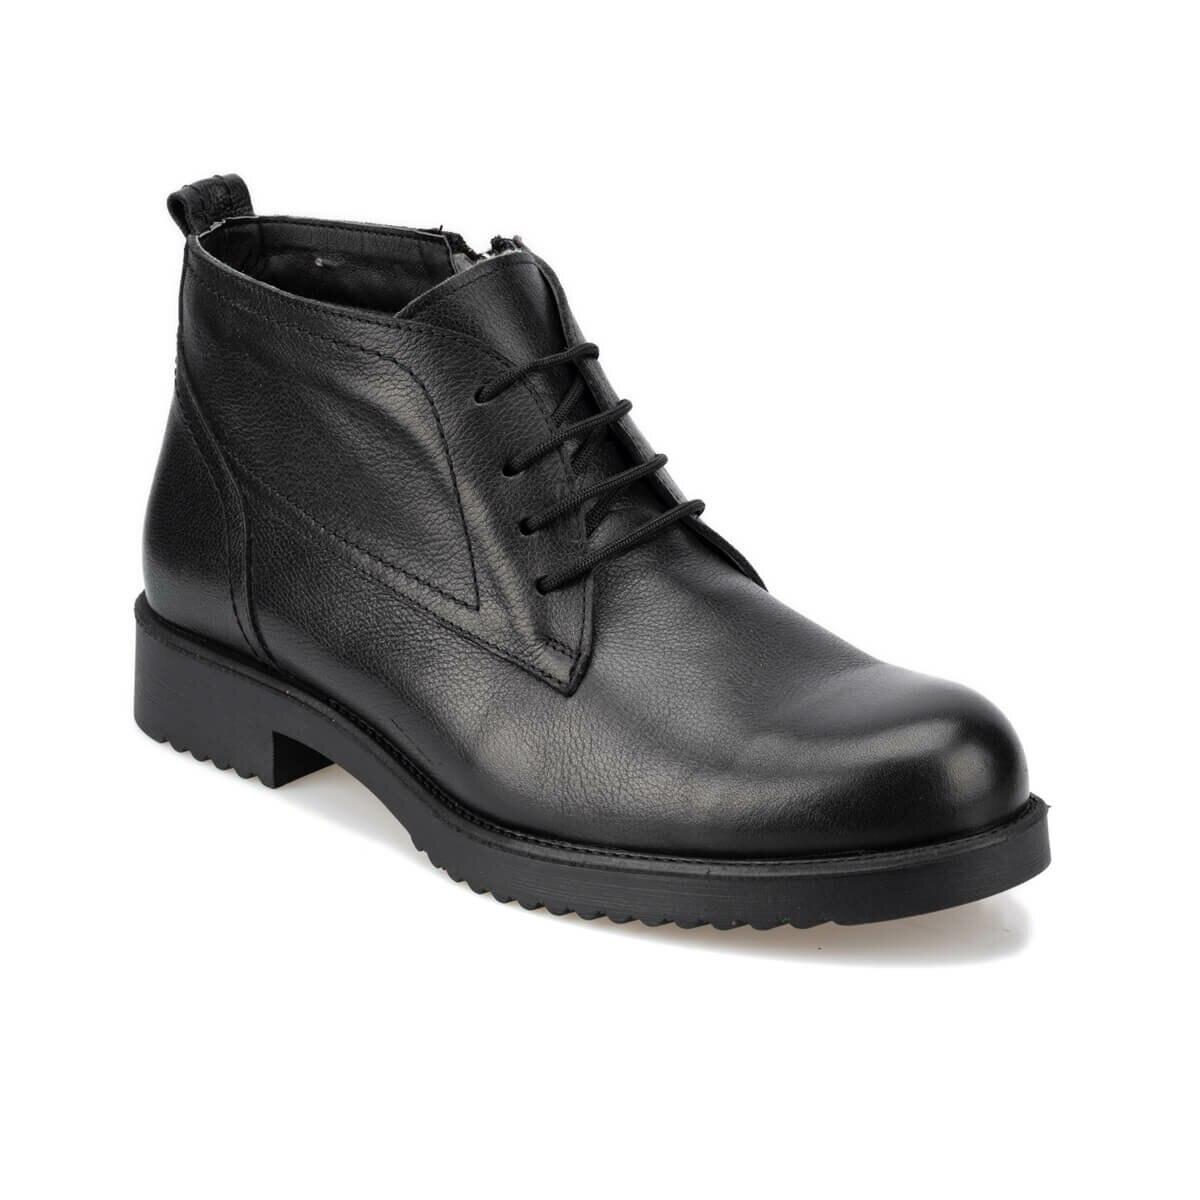 FLO 92.100934.M Black Men Boots Polaris 5 Point